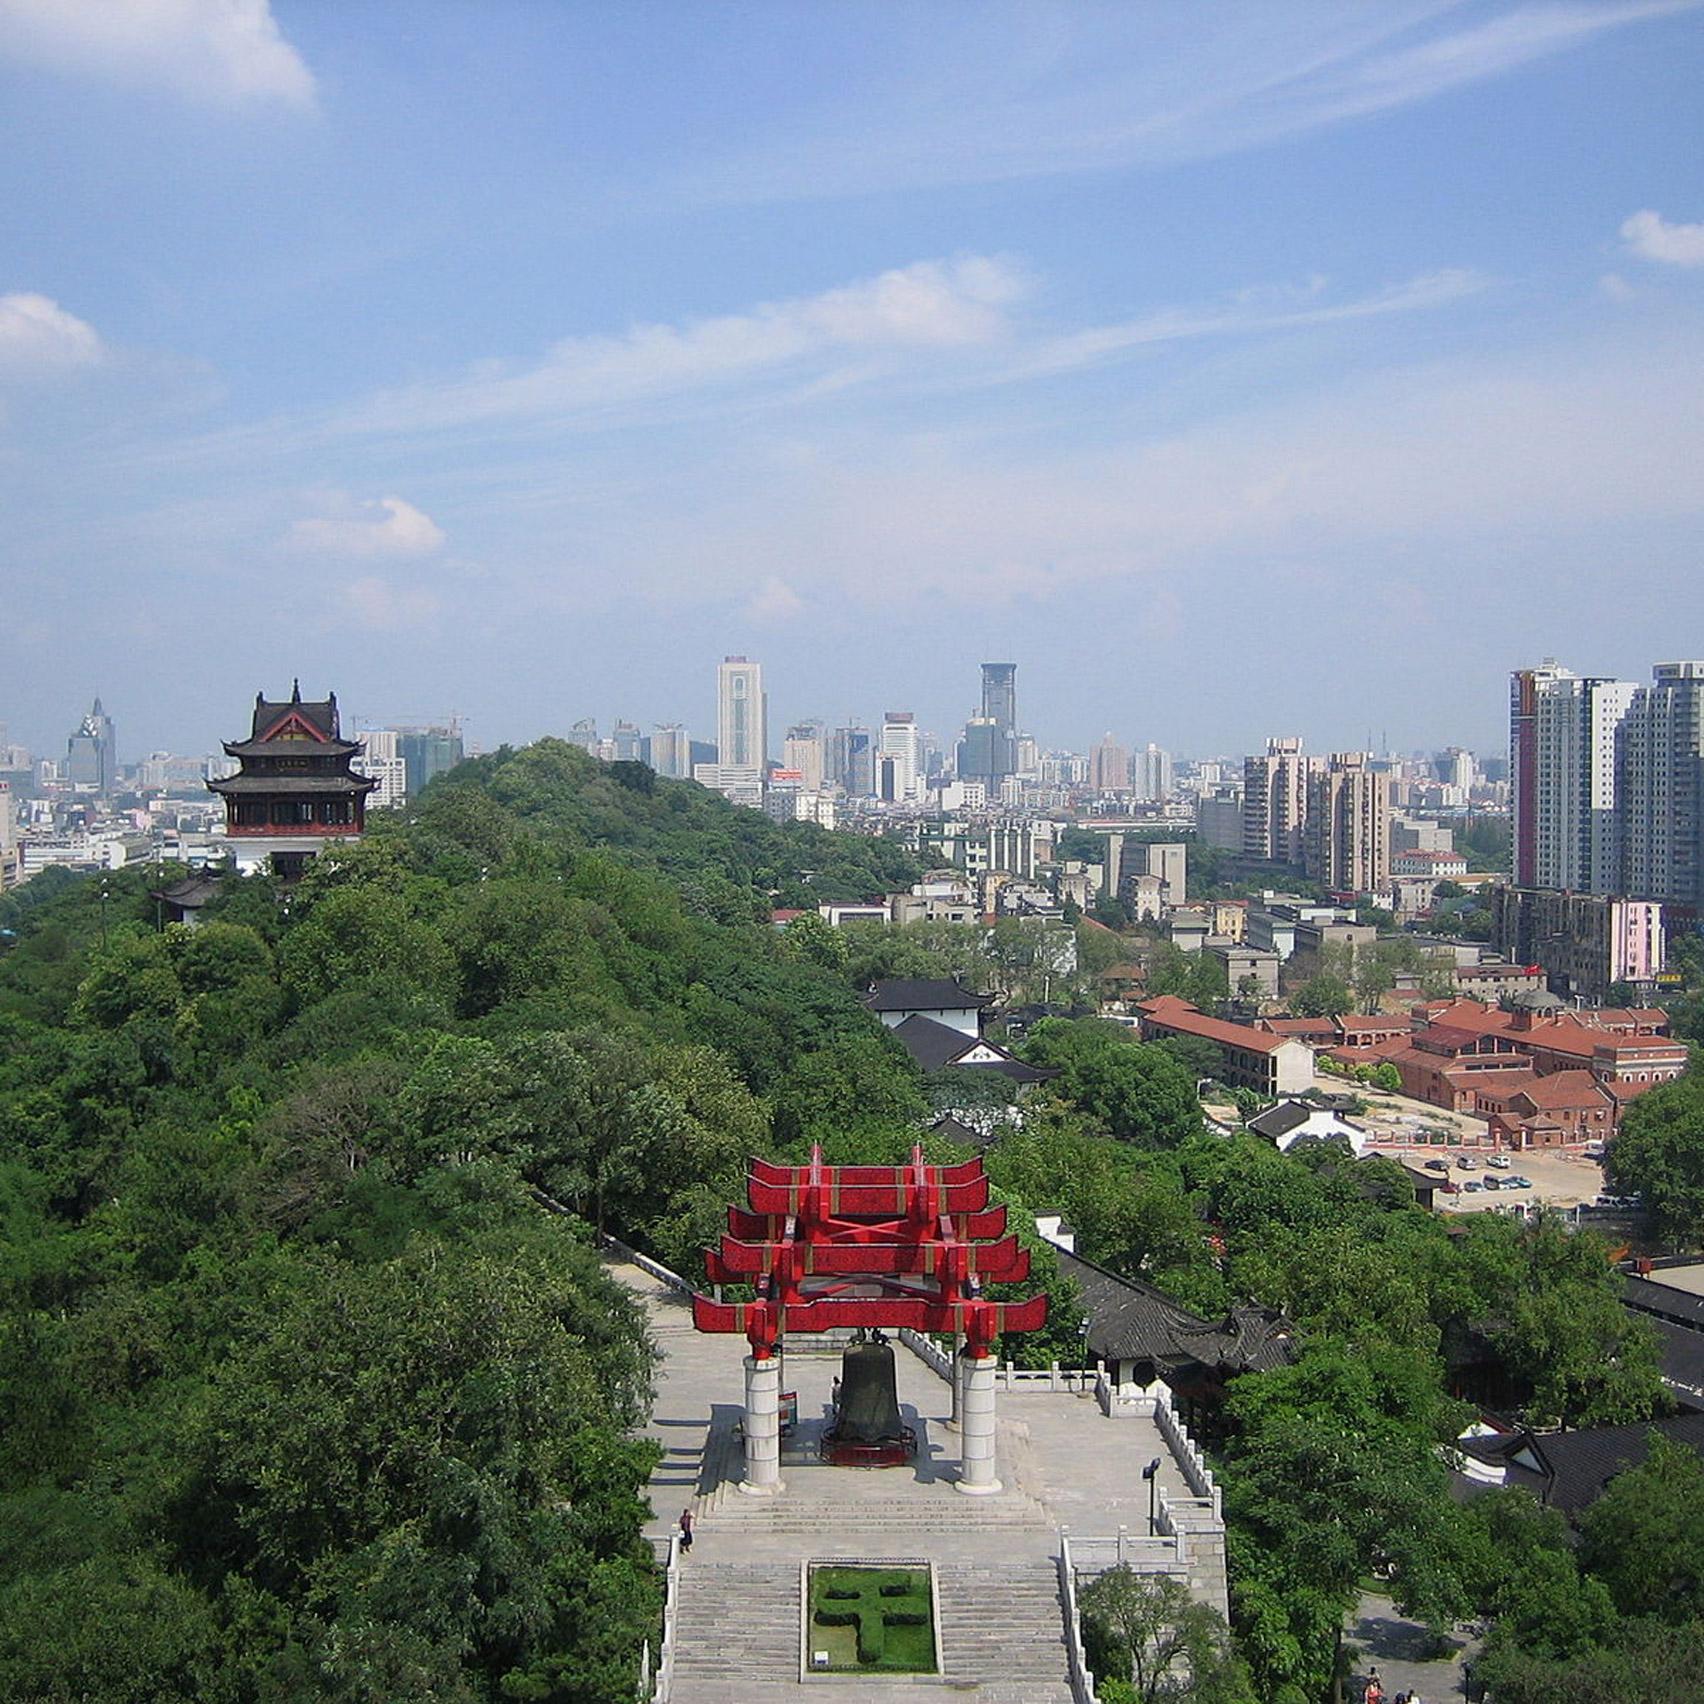 Wuhan building 1,000-bed hospital in 10 days to treat coronavirus